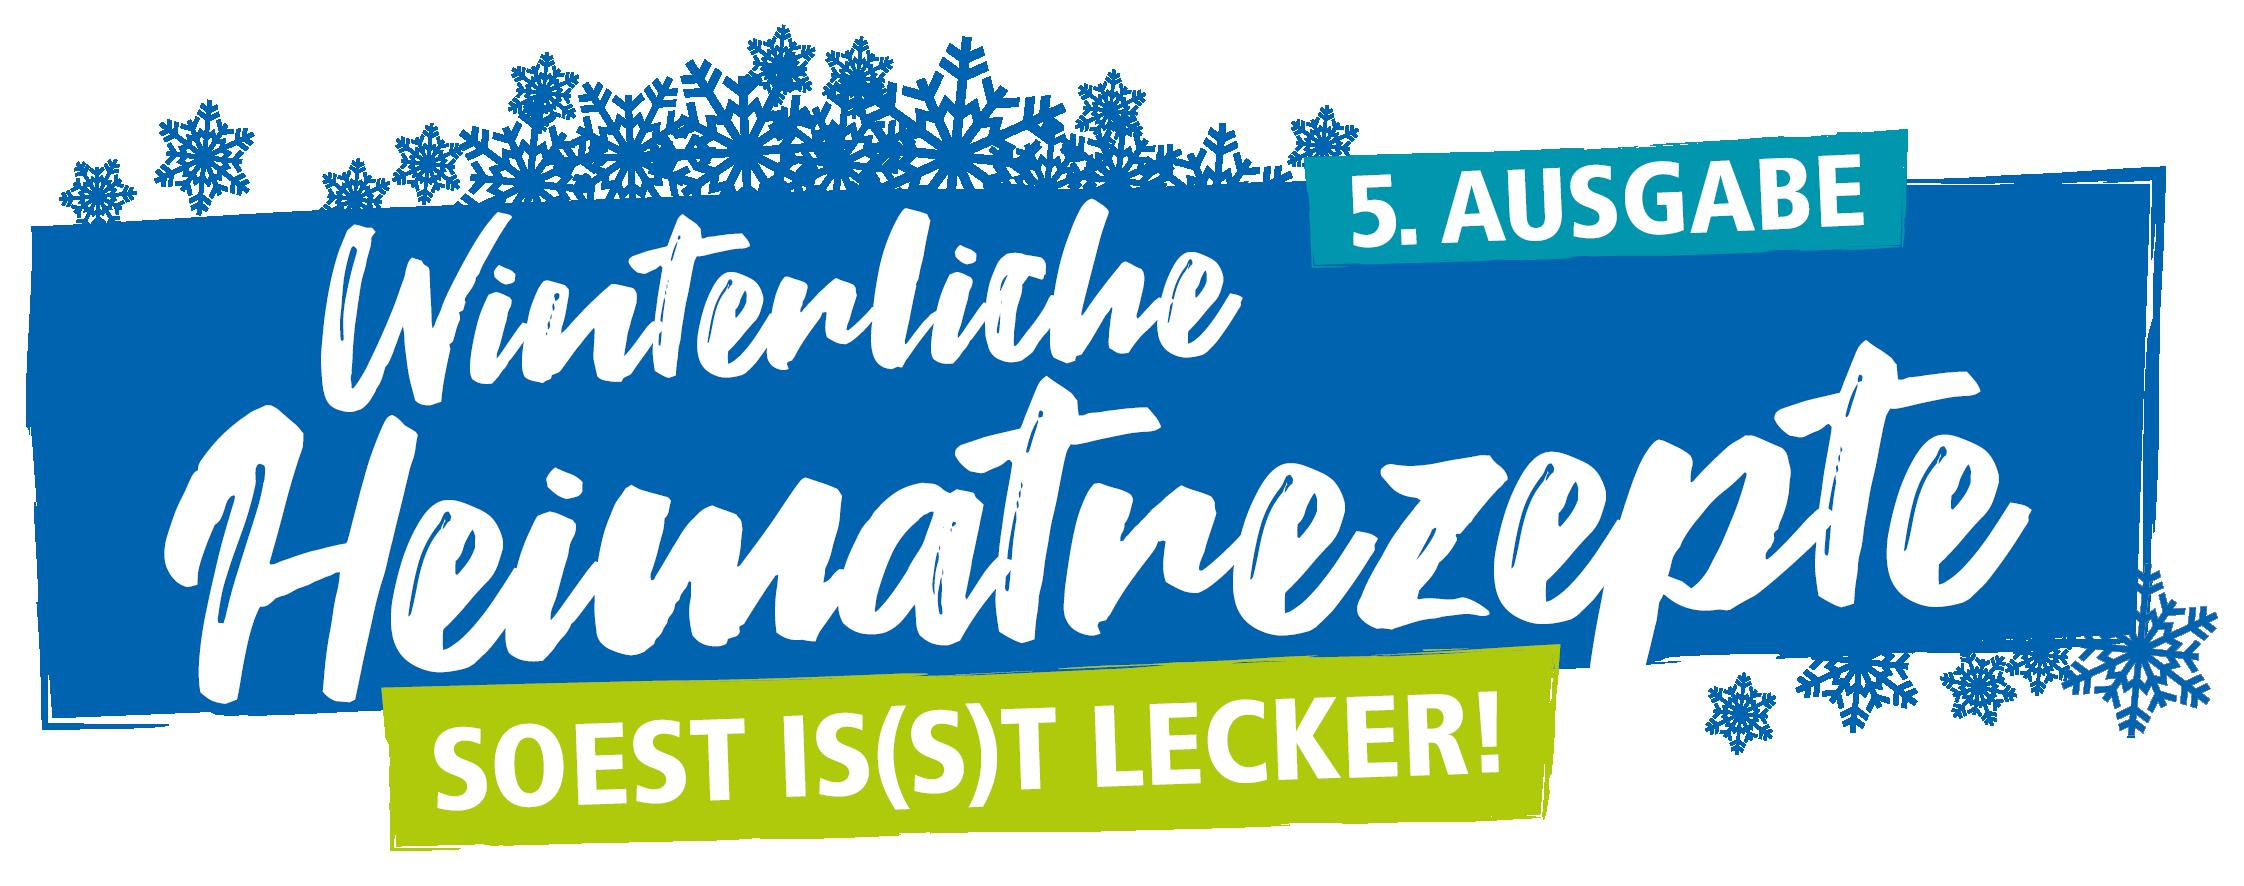 Heimatrezepte Soester Anzeiger